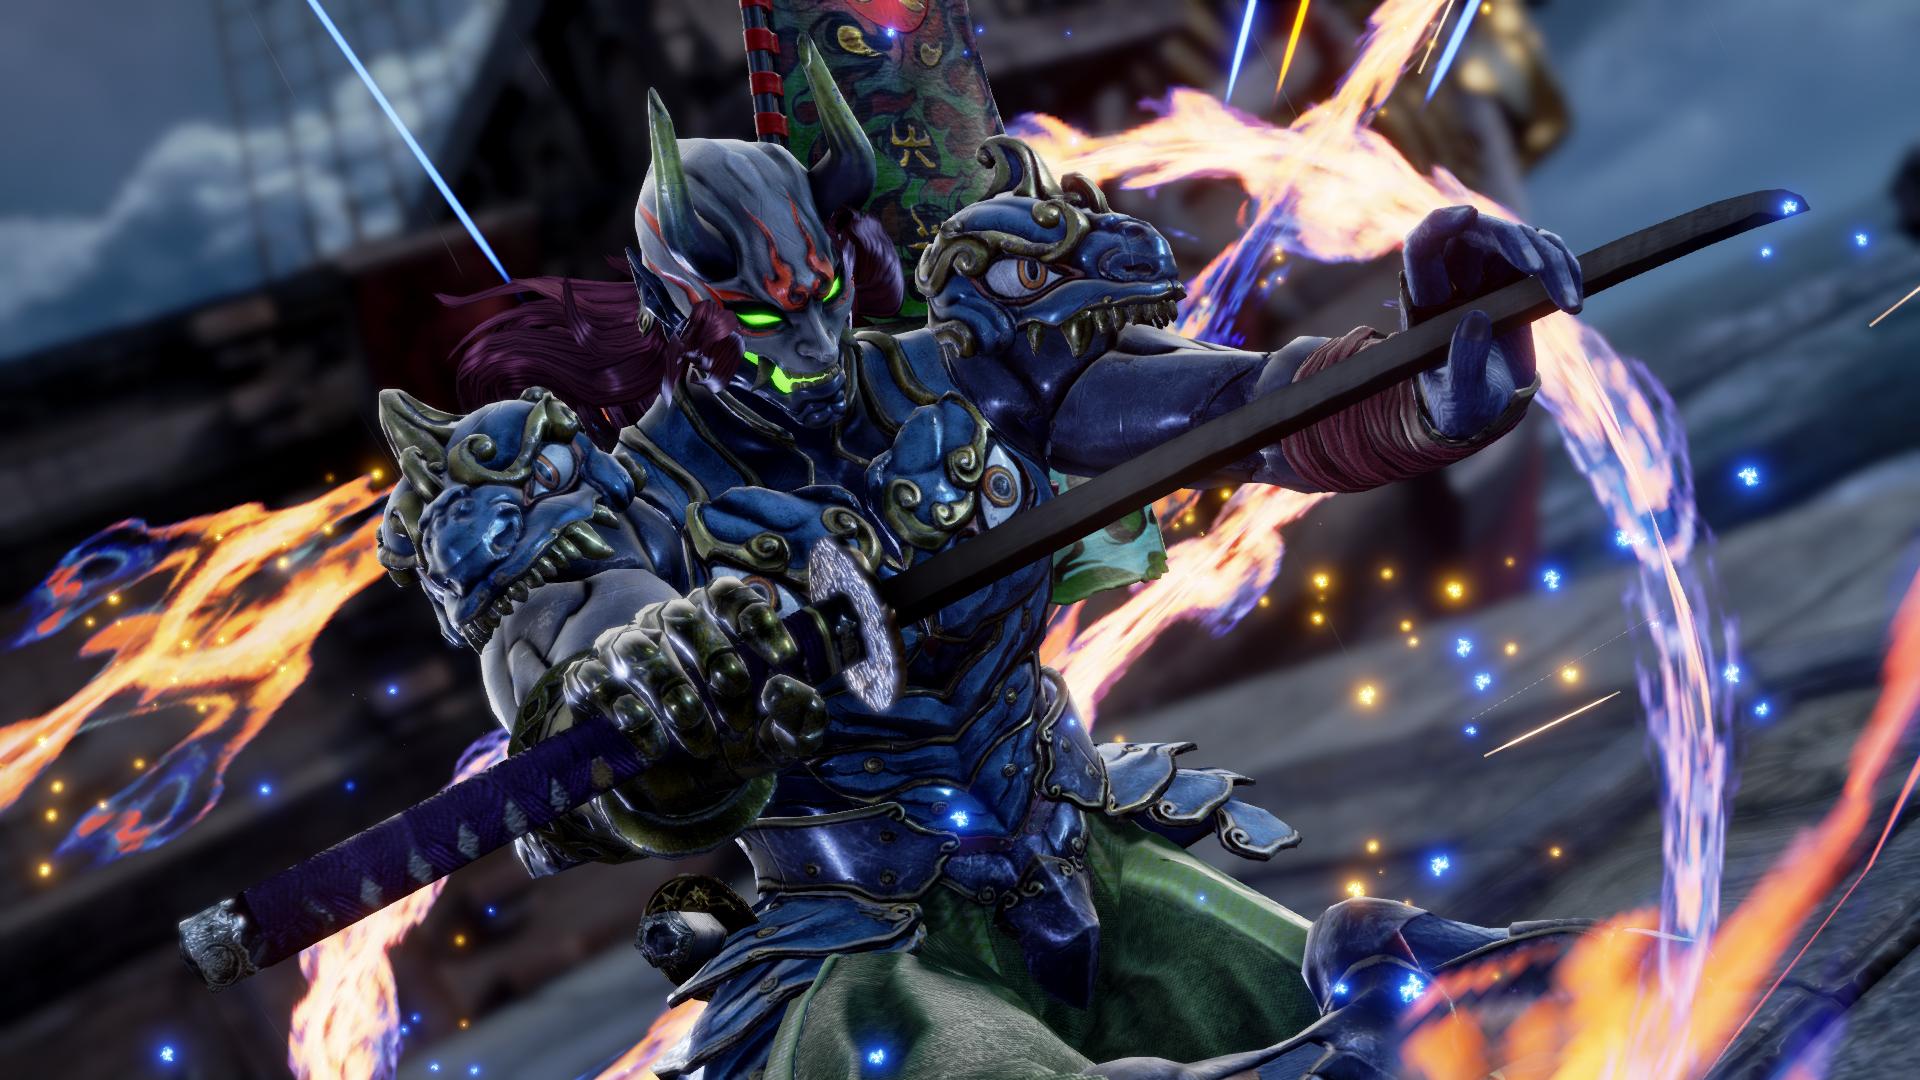 Yoshimitsu Confirmed For Soulcalibur Vi Gaming Access Weekly